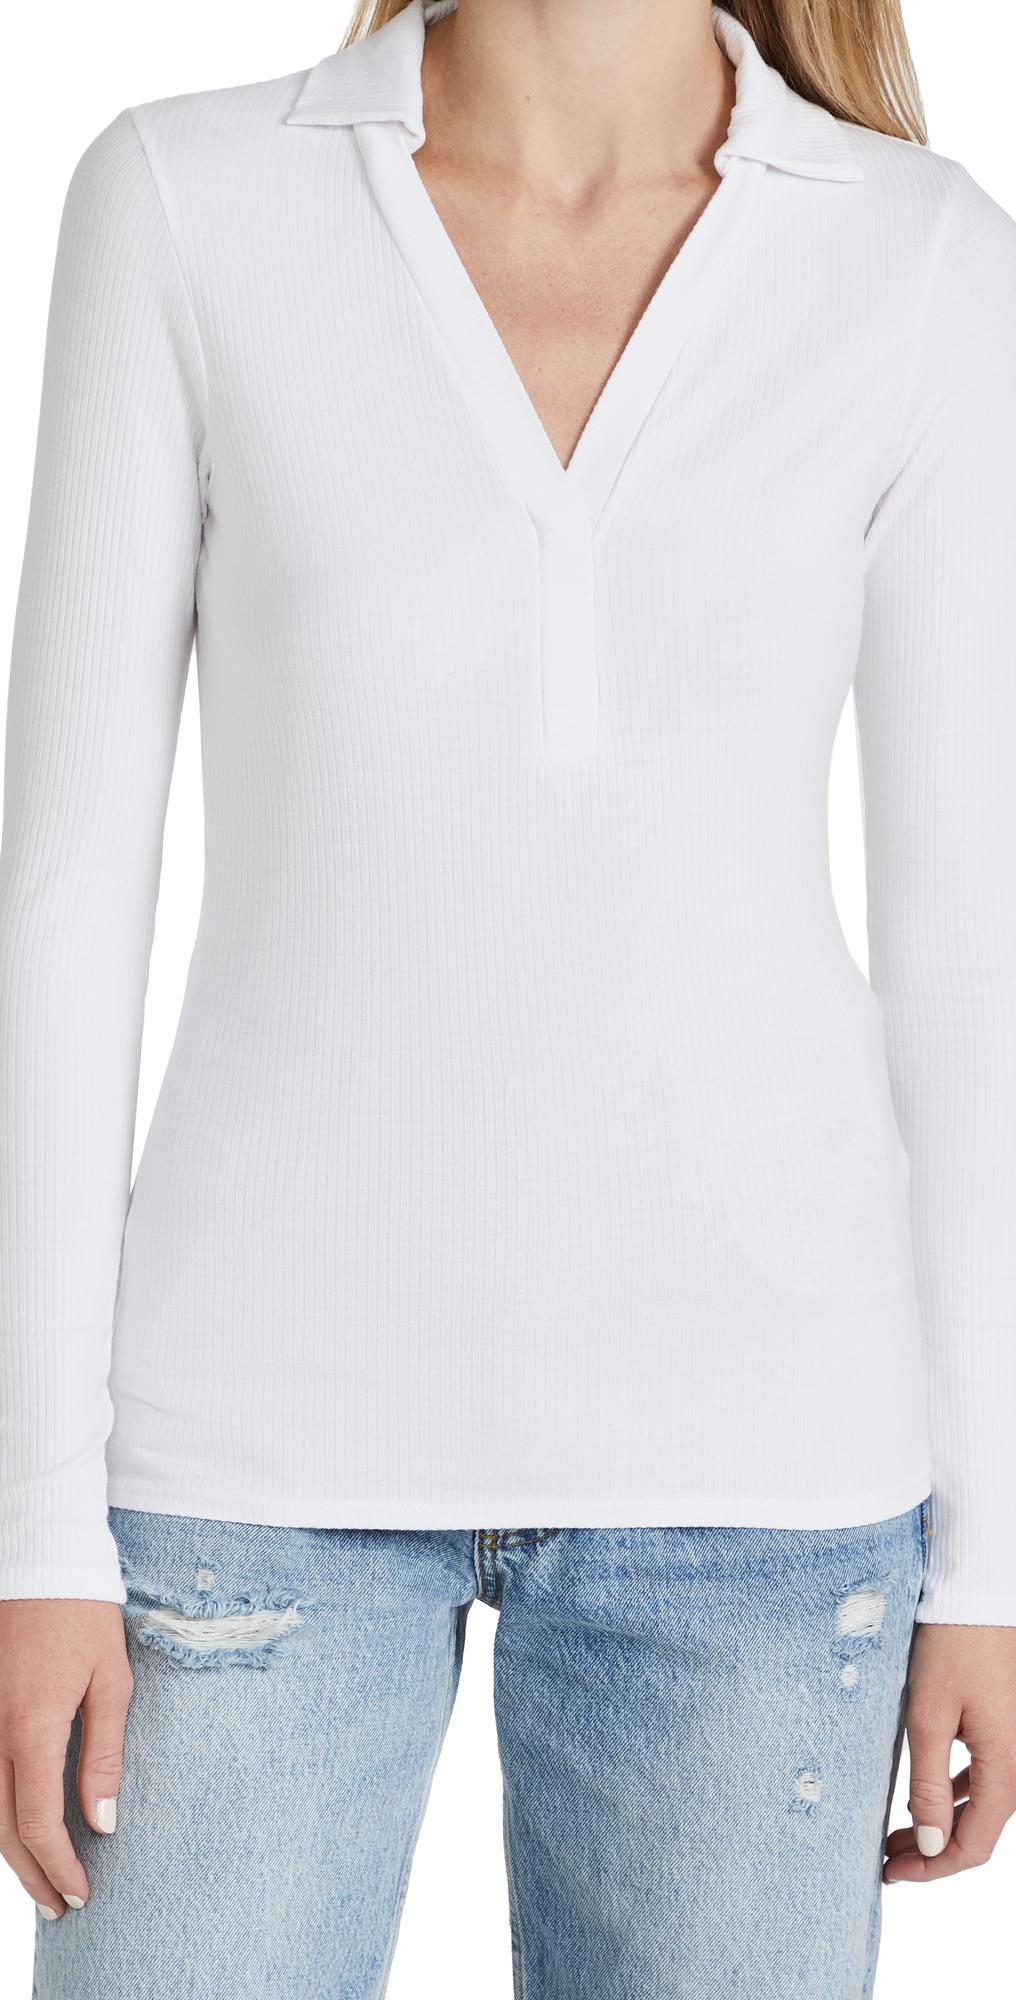 5X2 Silk Rib Long Sleeve Polo Shirt